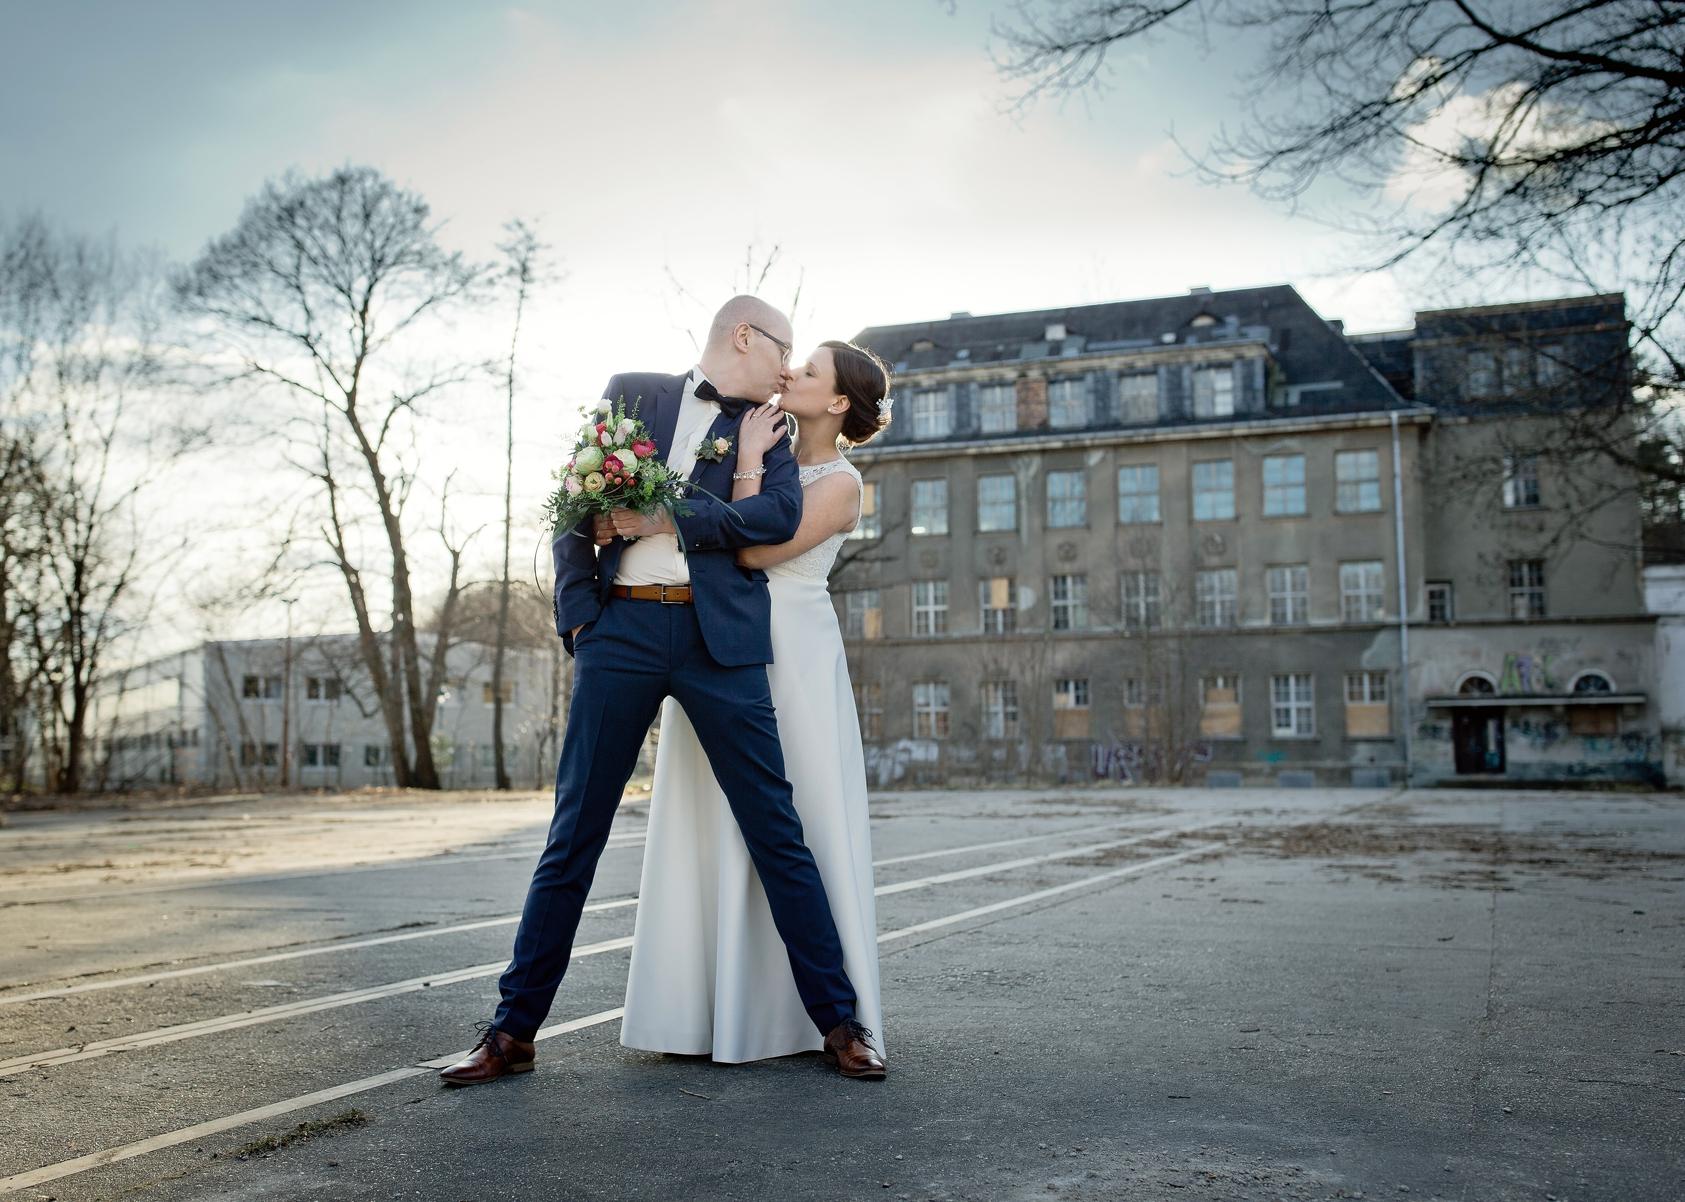 Fotograf Zschopau, Hochzeitsfotograf Zschopau, Schloss Wildeck Hochzeit, Schloss Wildeck Zschoapu Hochzeit, Trauung auf Schloss Wildeck in Zschopau - Fotograf Schönherrfabrik Chemnitz